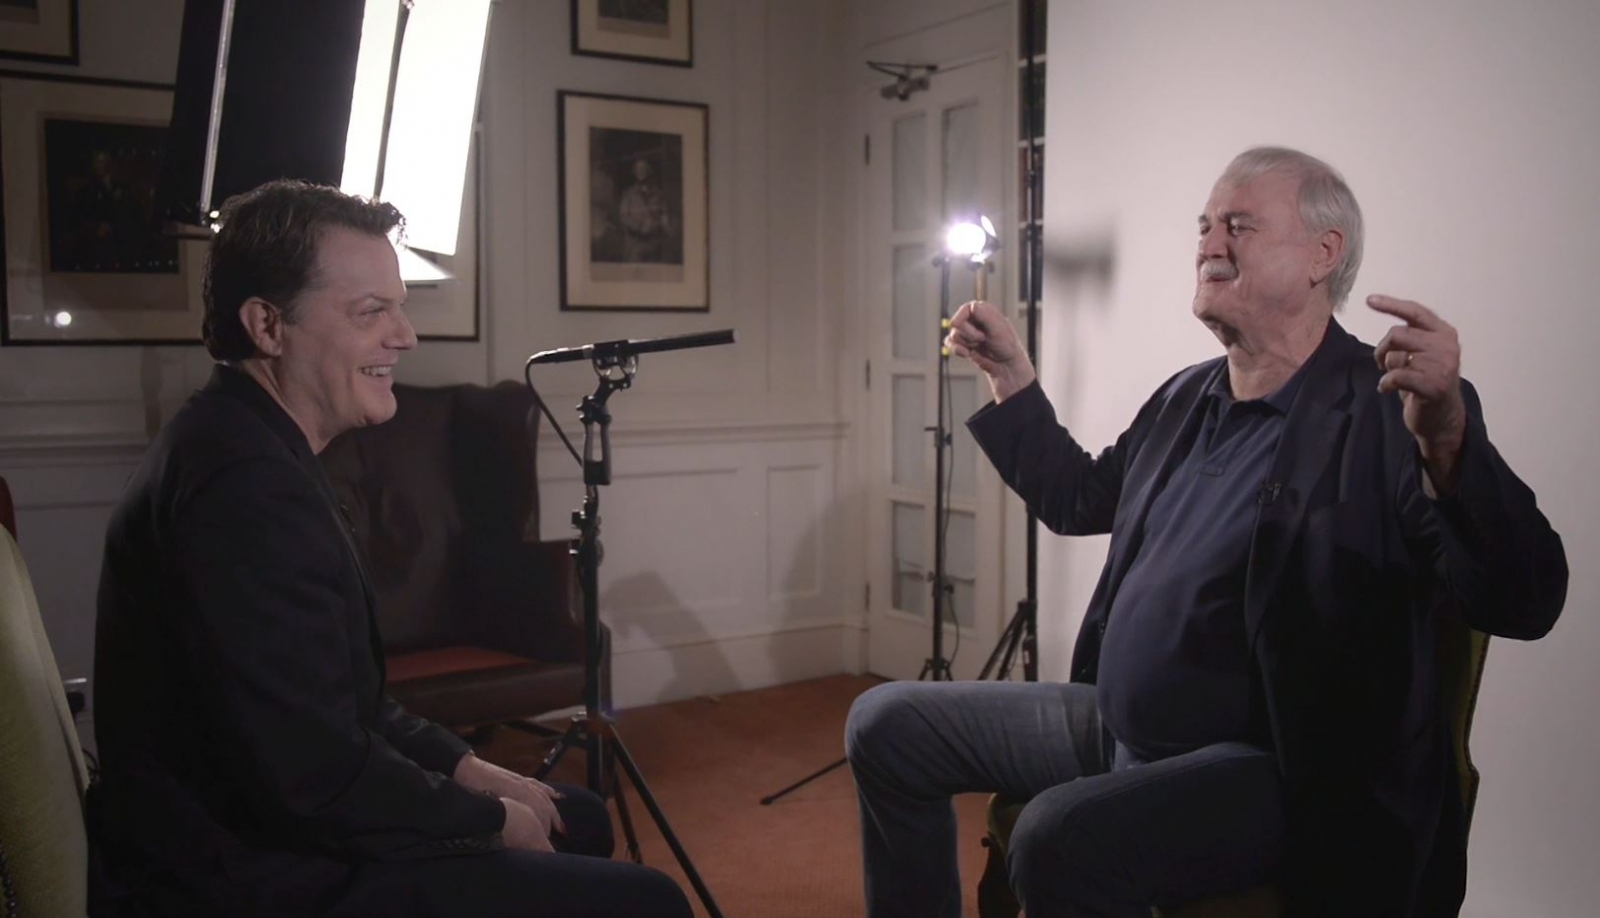 Eddie Izzard Interviews John Cleese on this Comedy Career